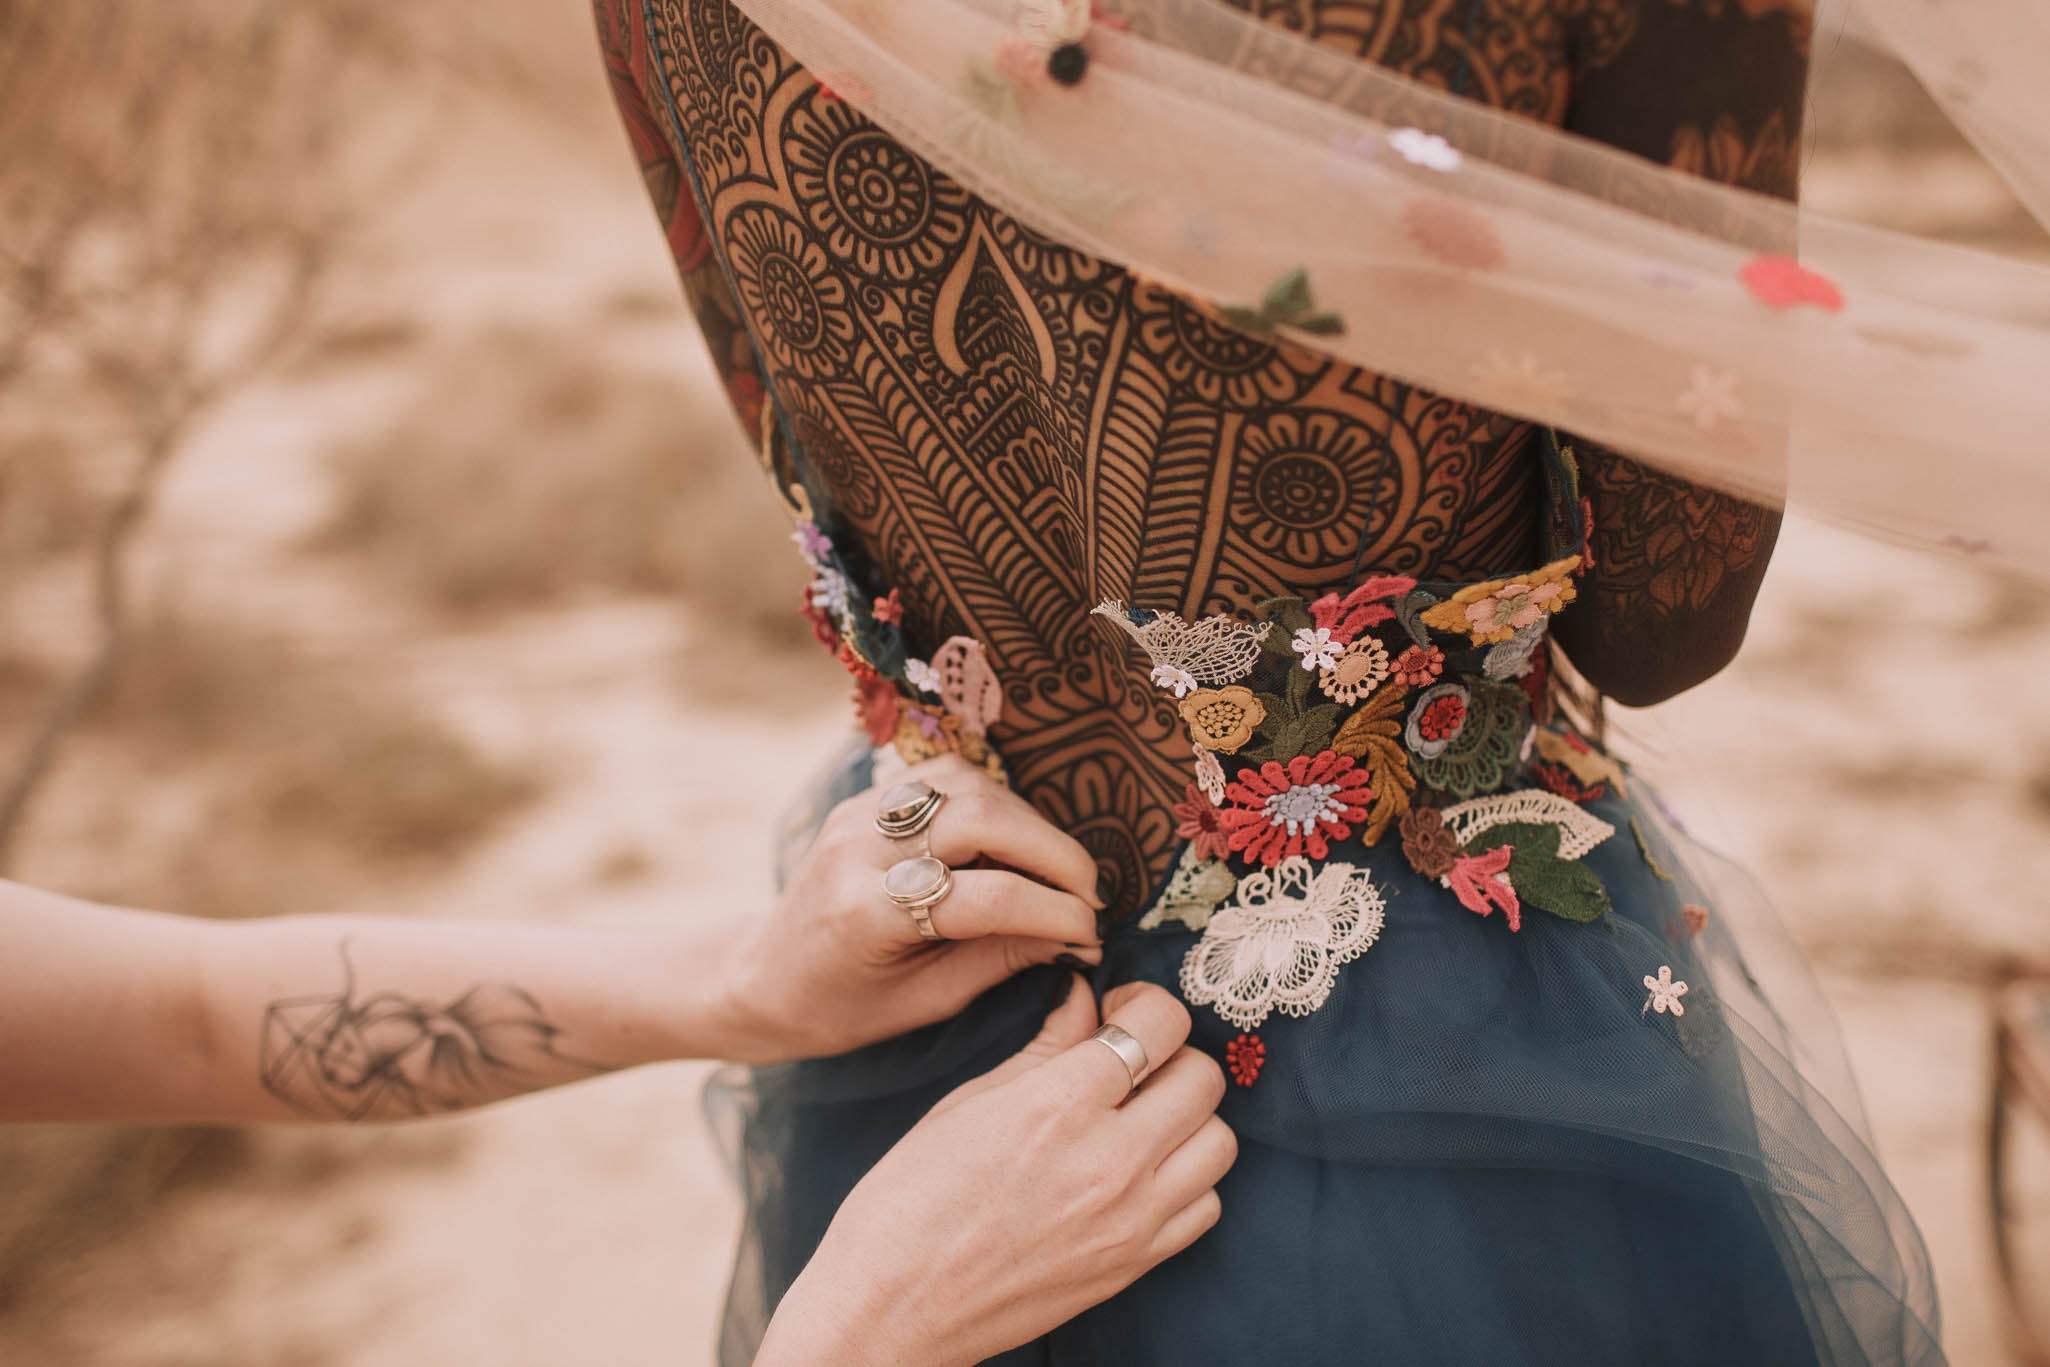 Spain-wedding-photographer-bardenas-reales-jeremy-boyer-photographe-mariage-bordeaux-floral-wedding-dress-robe-60.jpg